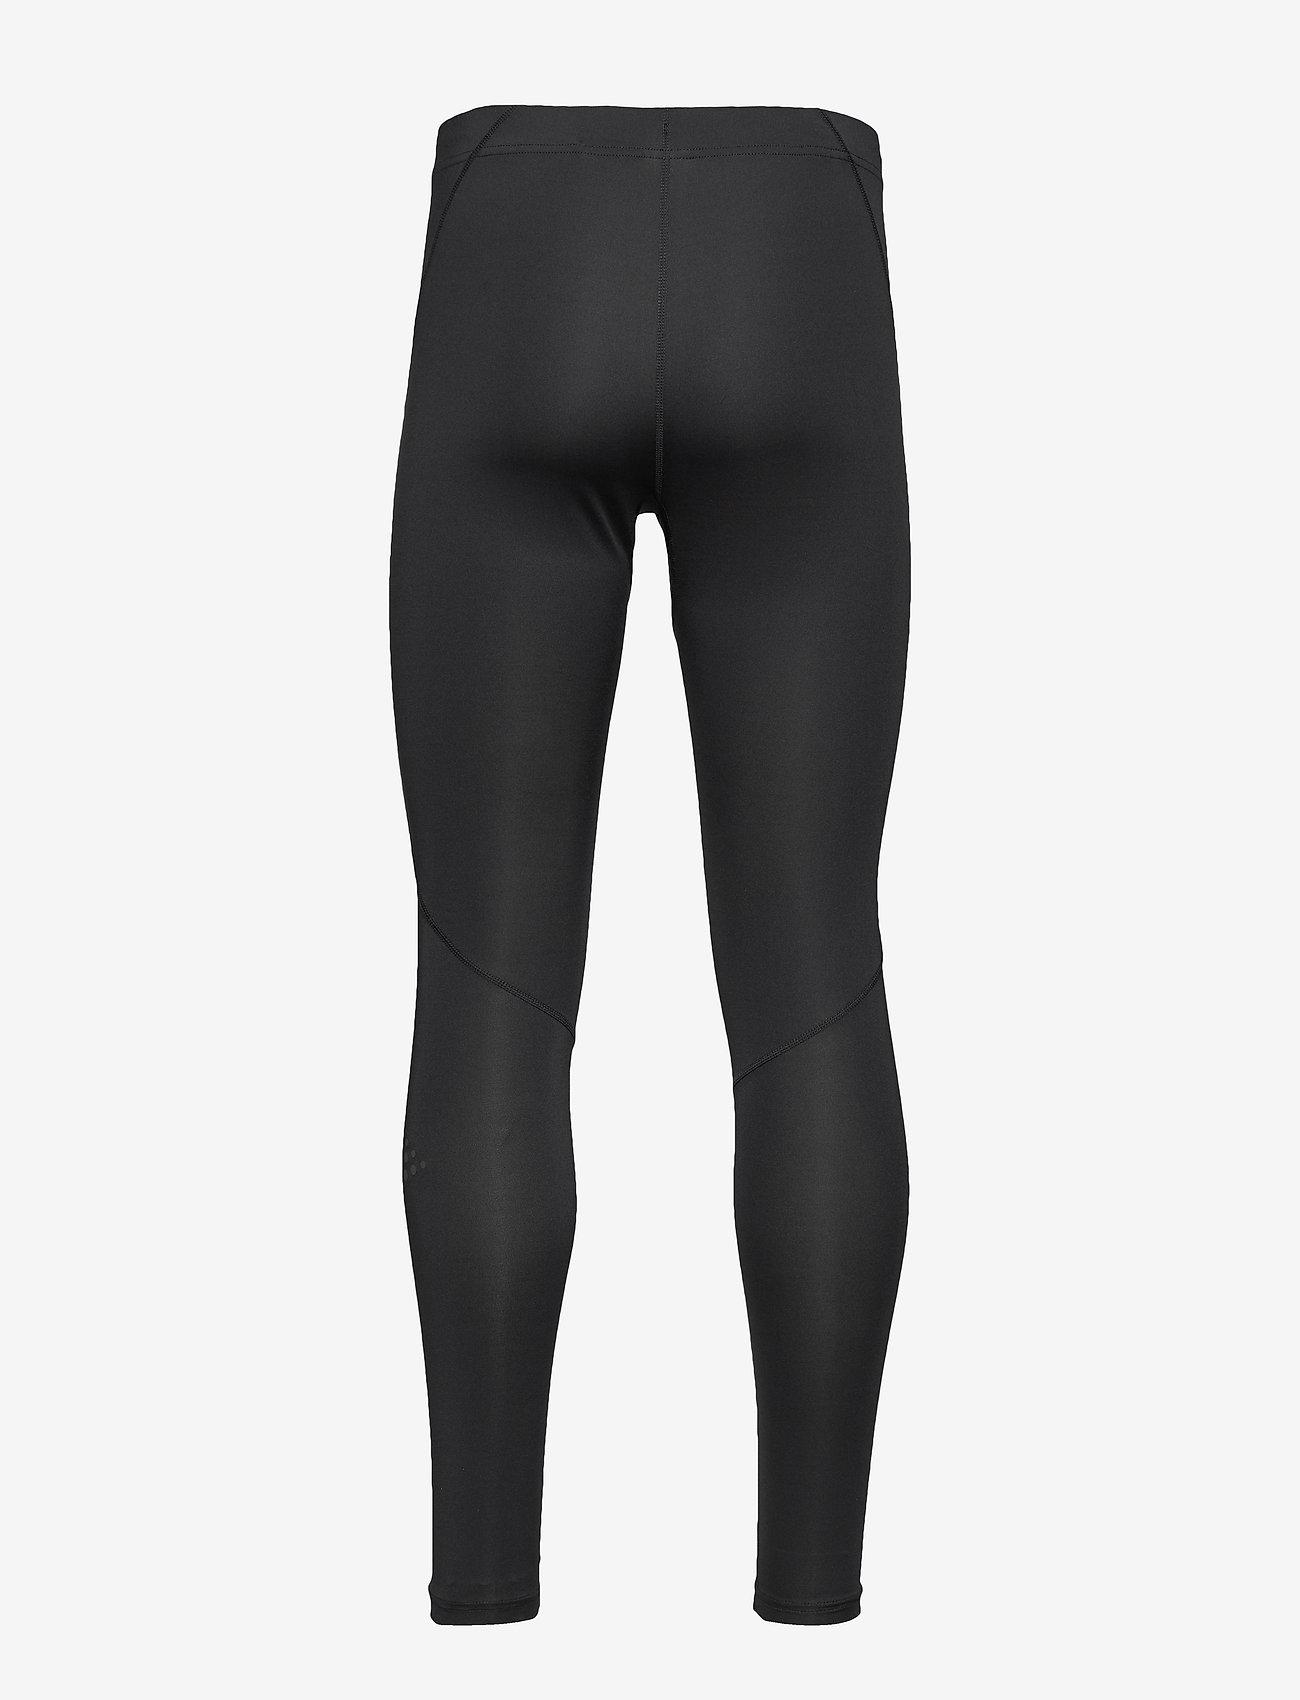 Craft - CORE ESSENCE TIGHTS M - running & training tights - black - 1